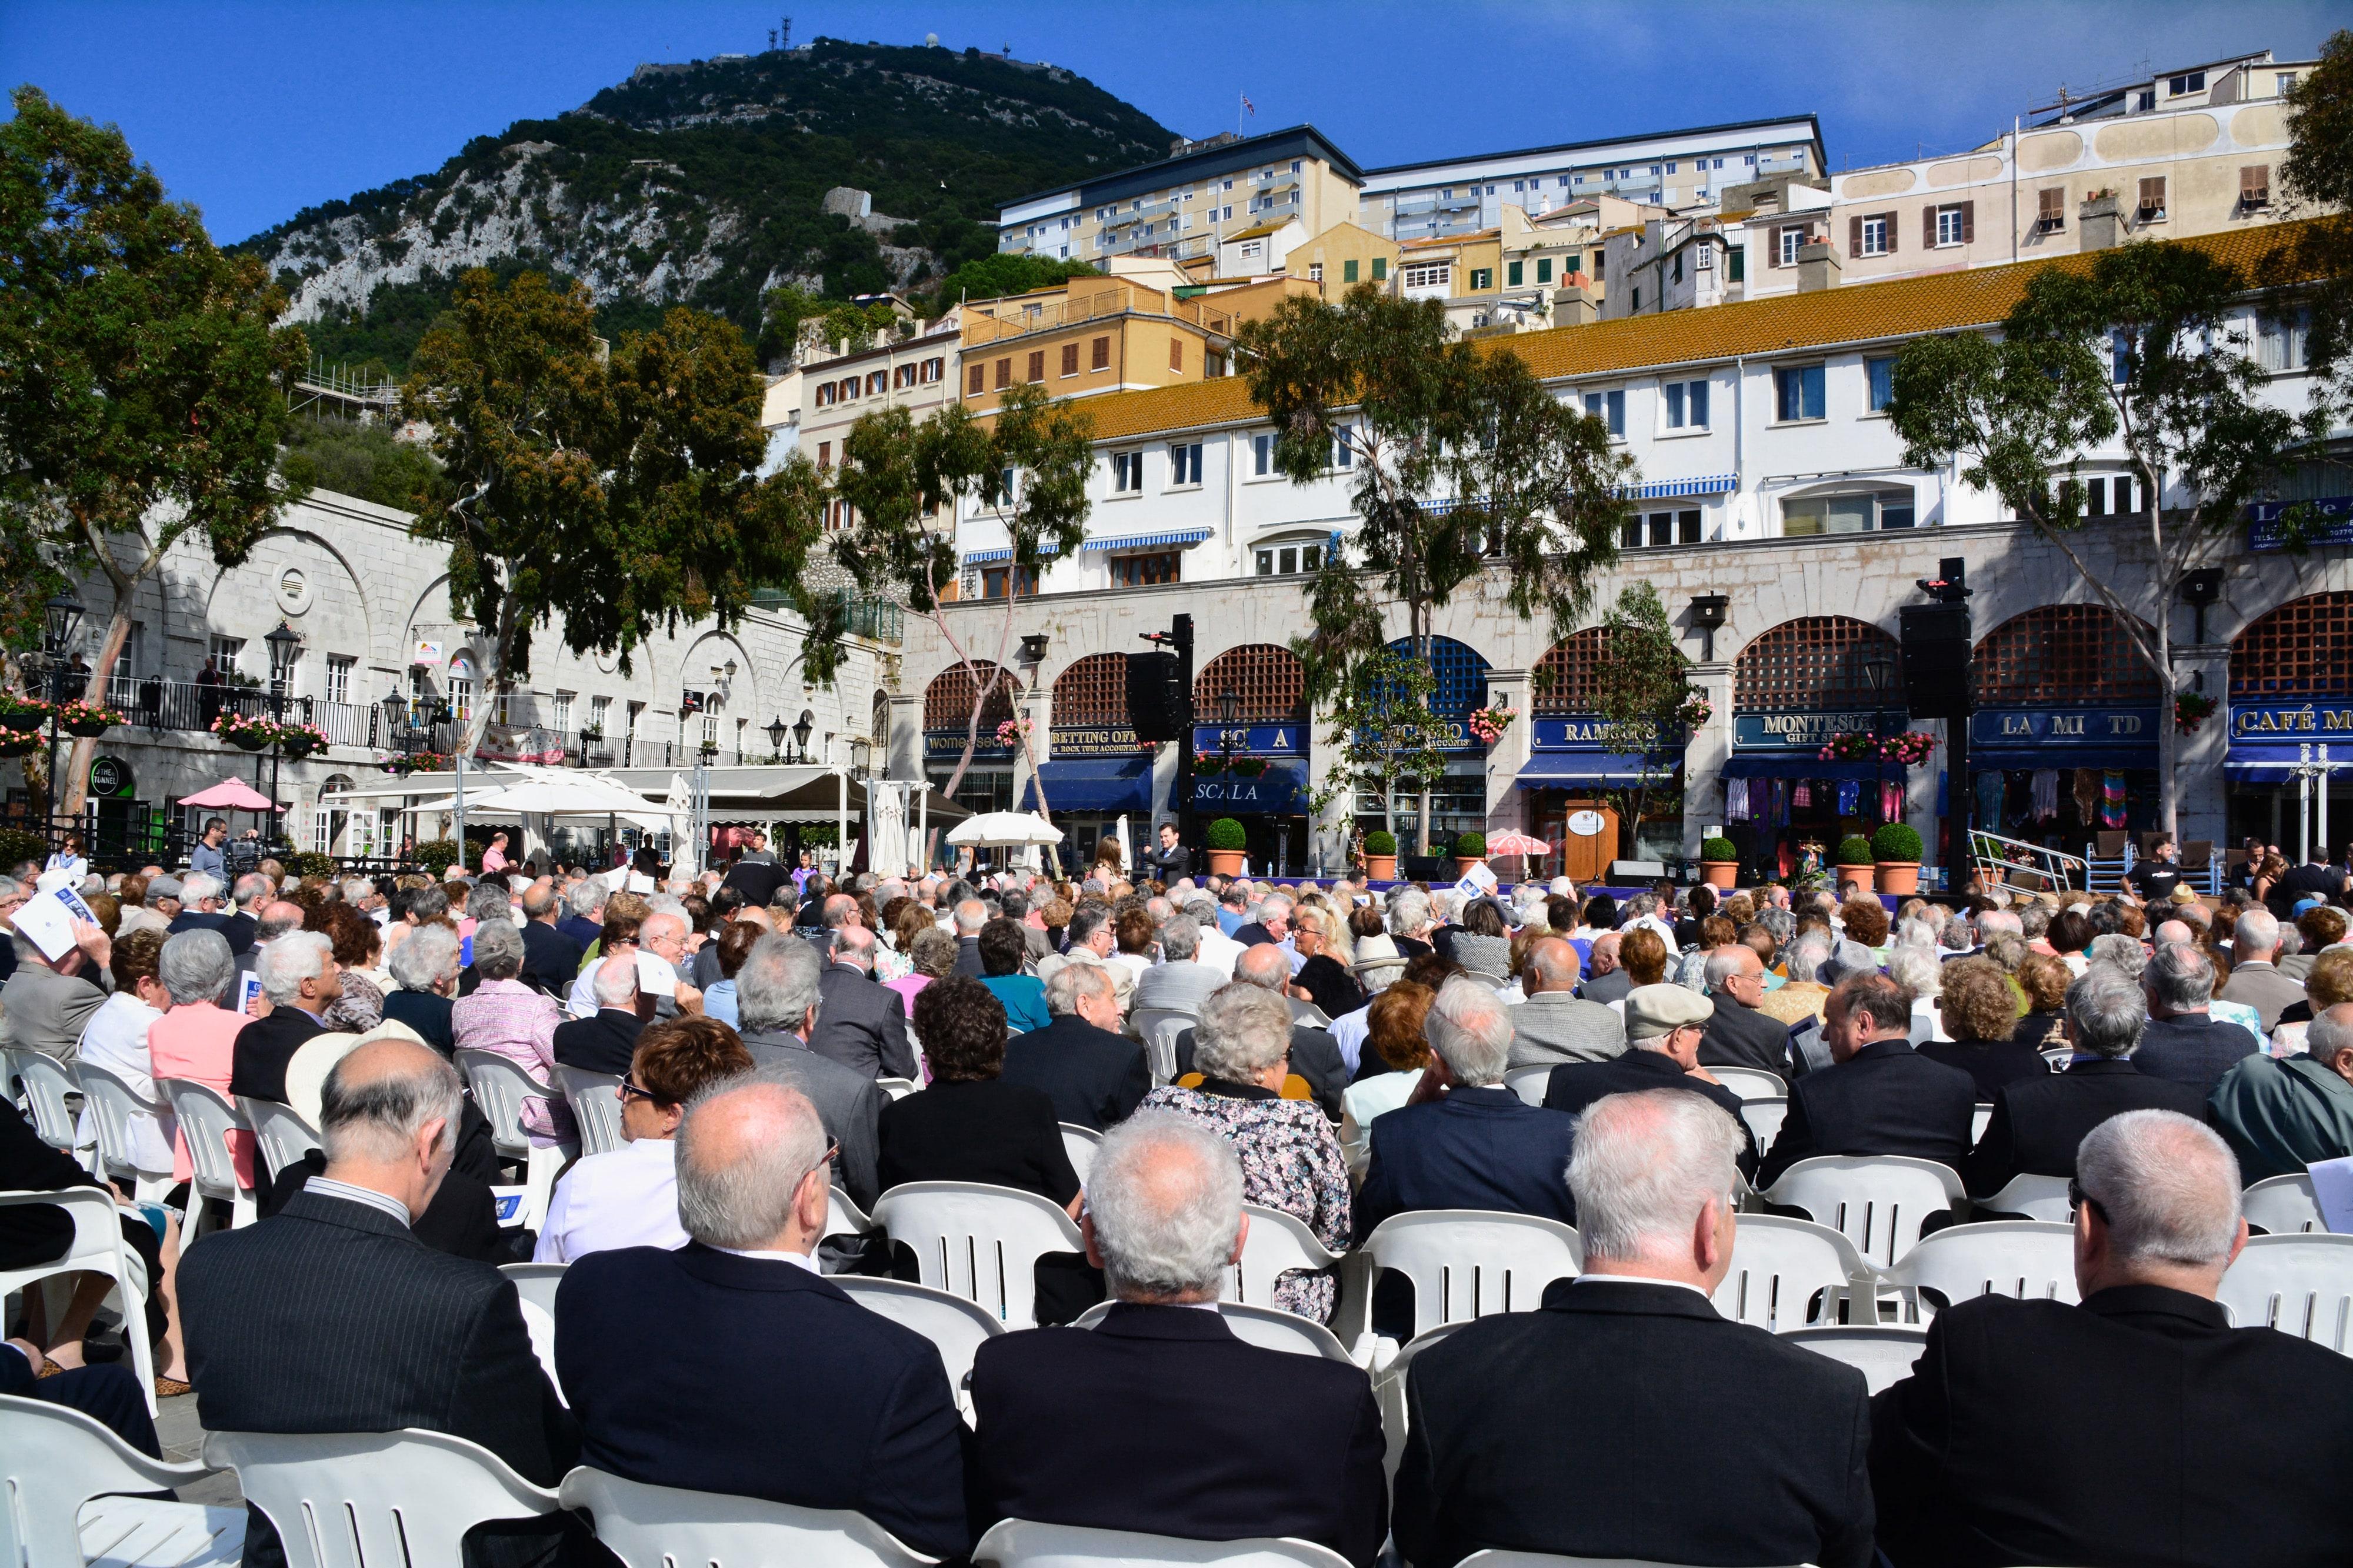 gibraltar-evacuation-dsc_3615_17381701164_o